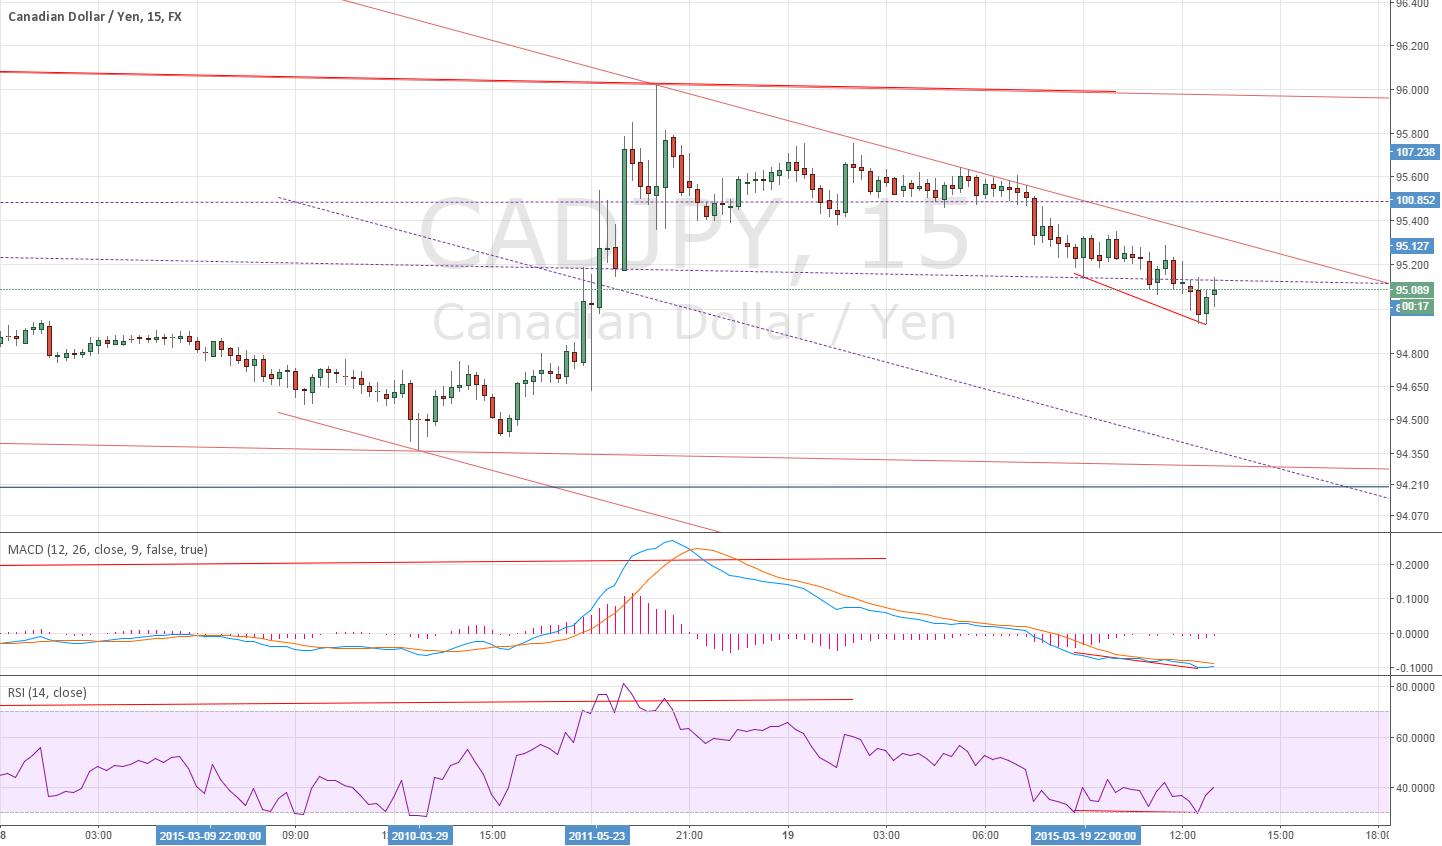 15 Min for CADJPY divergence ~